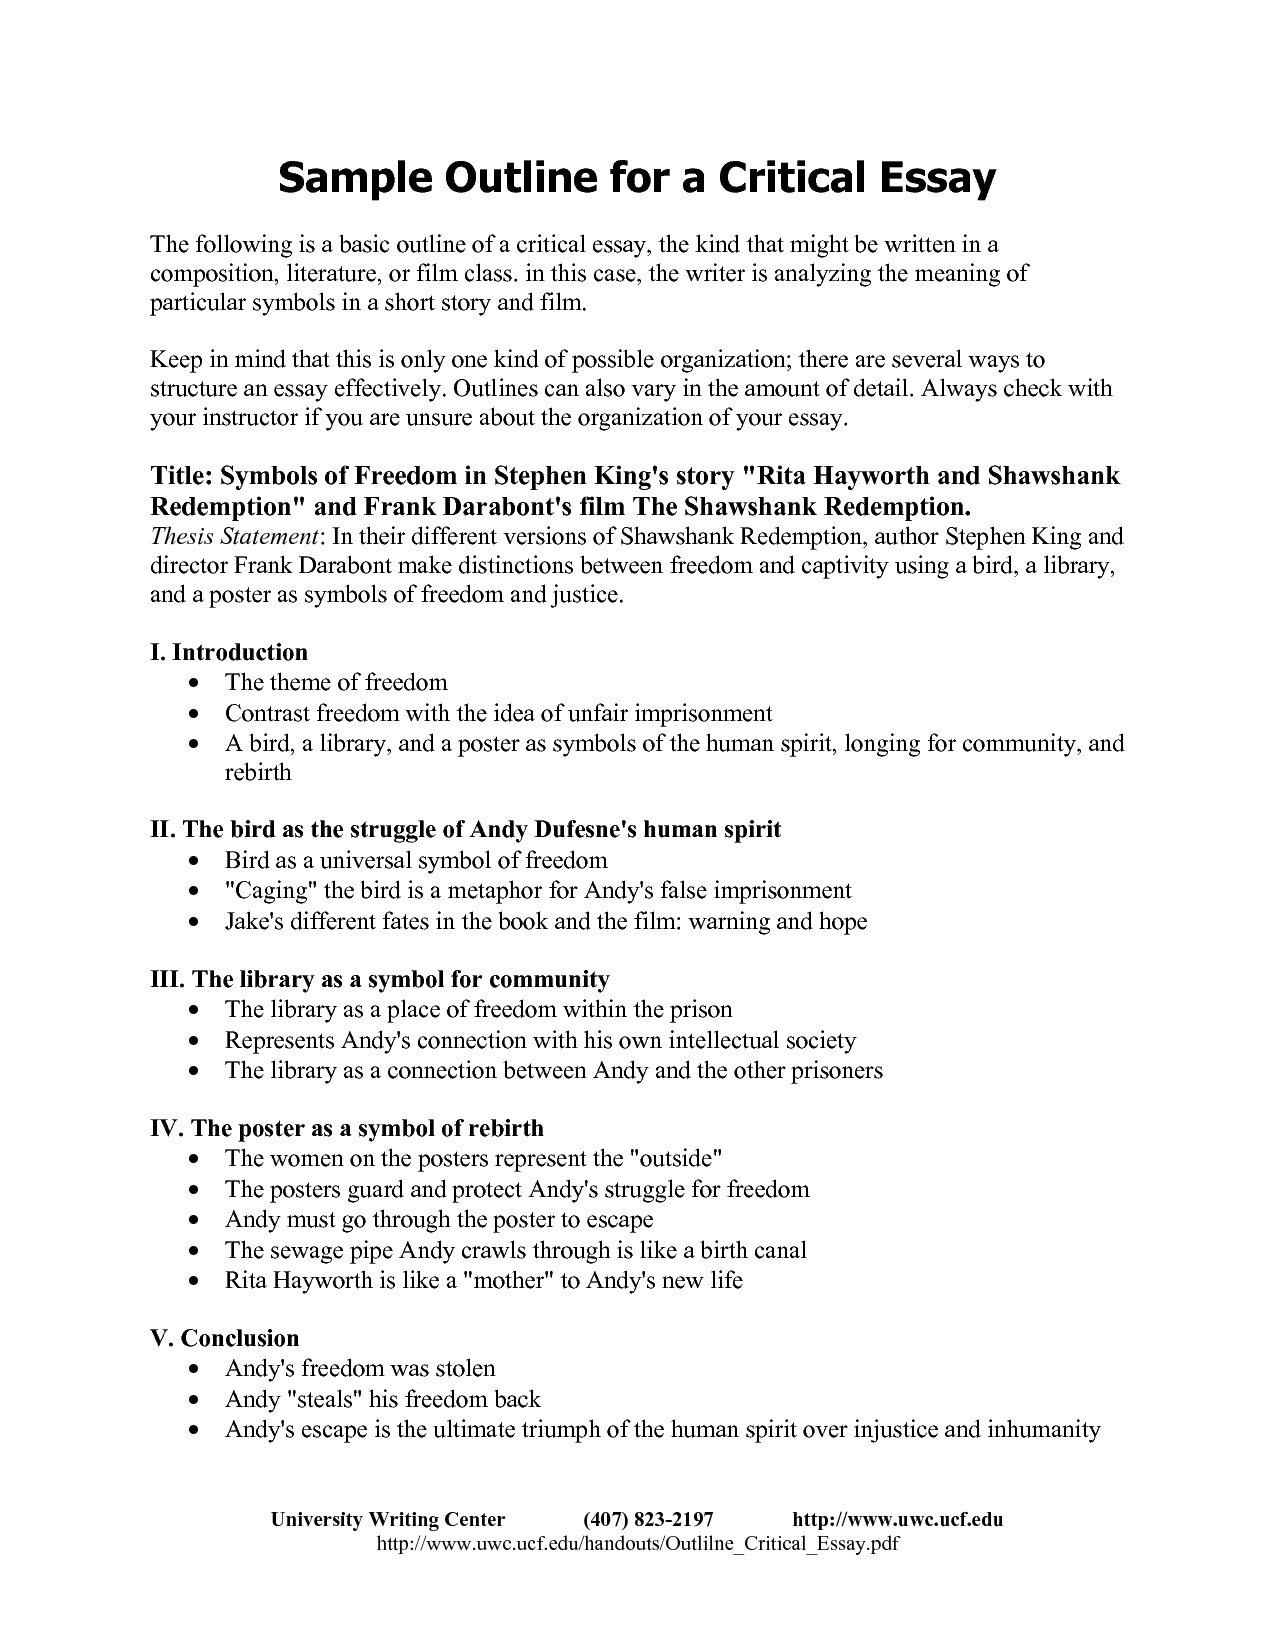 Evaluation essay of a book